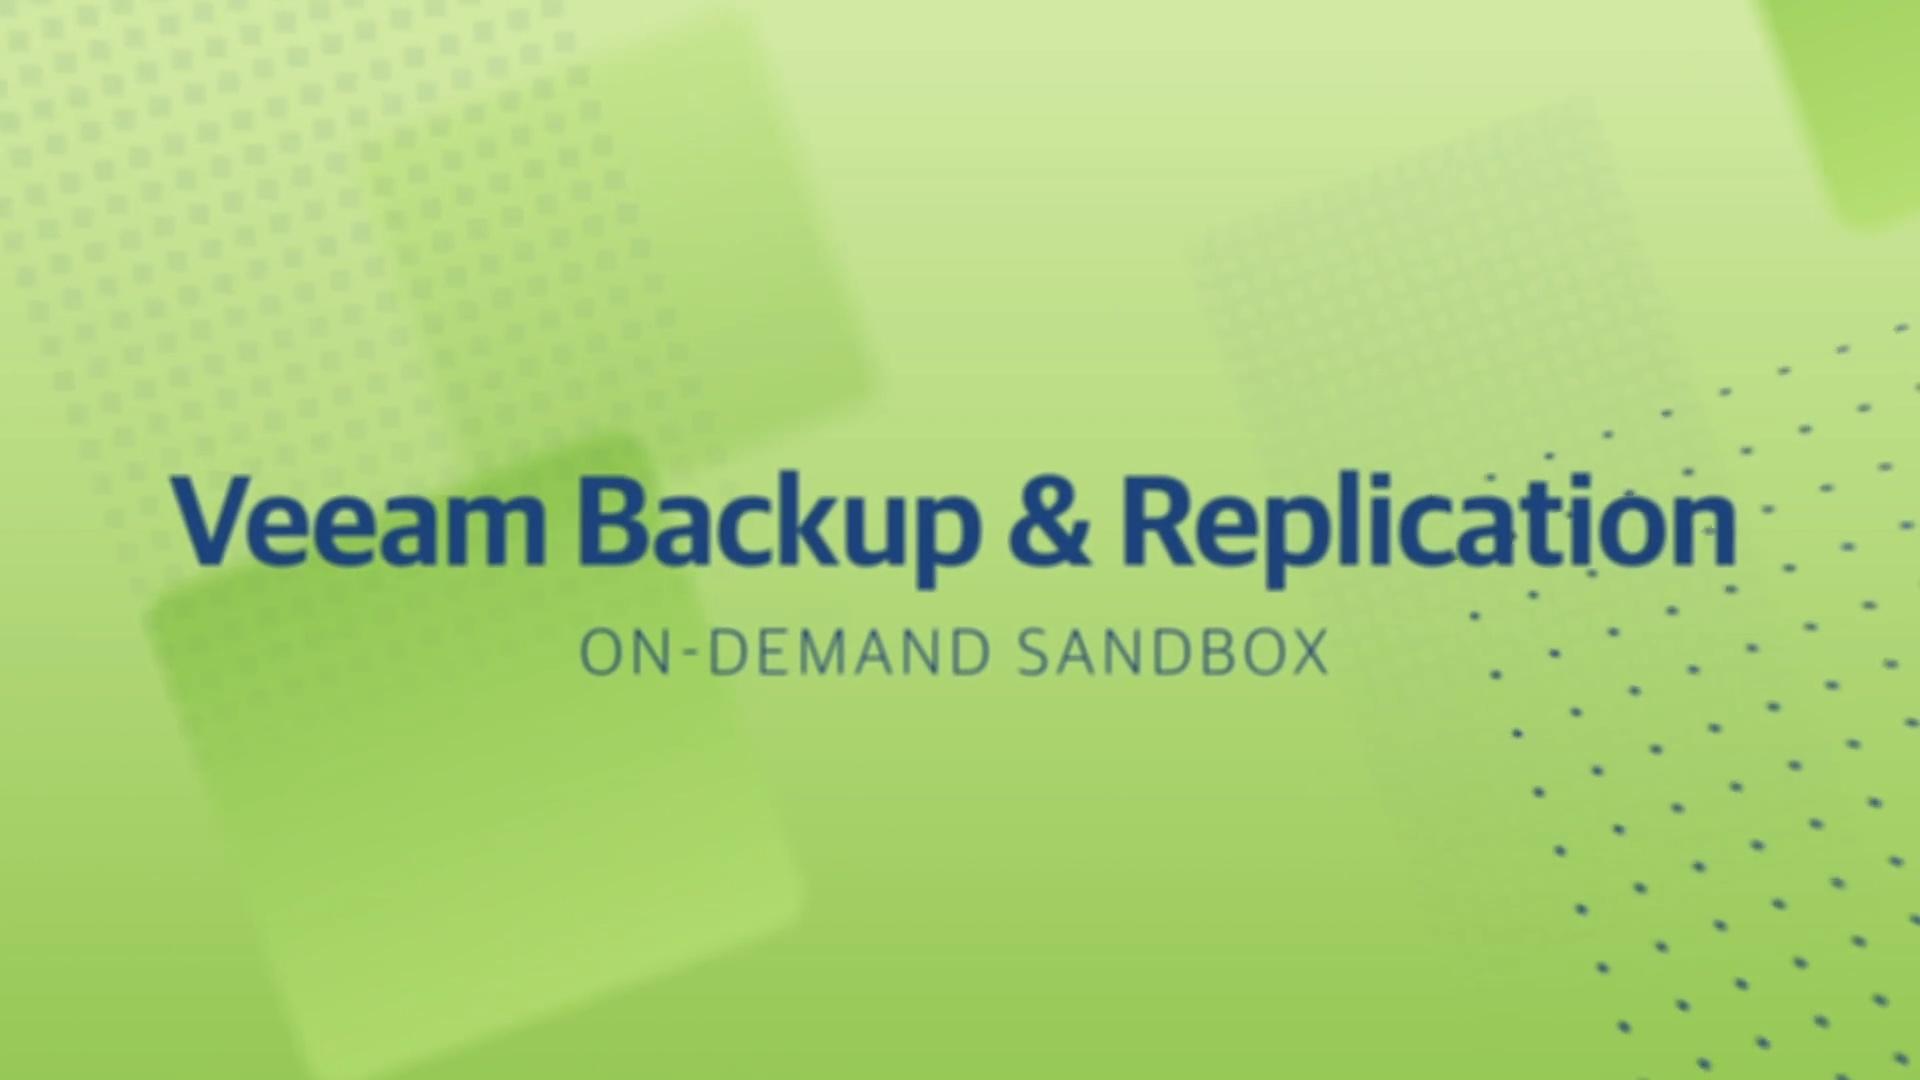 Product launch v11 - VBR - On-Demand Sandbox